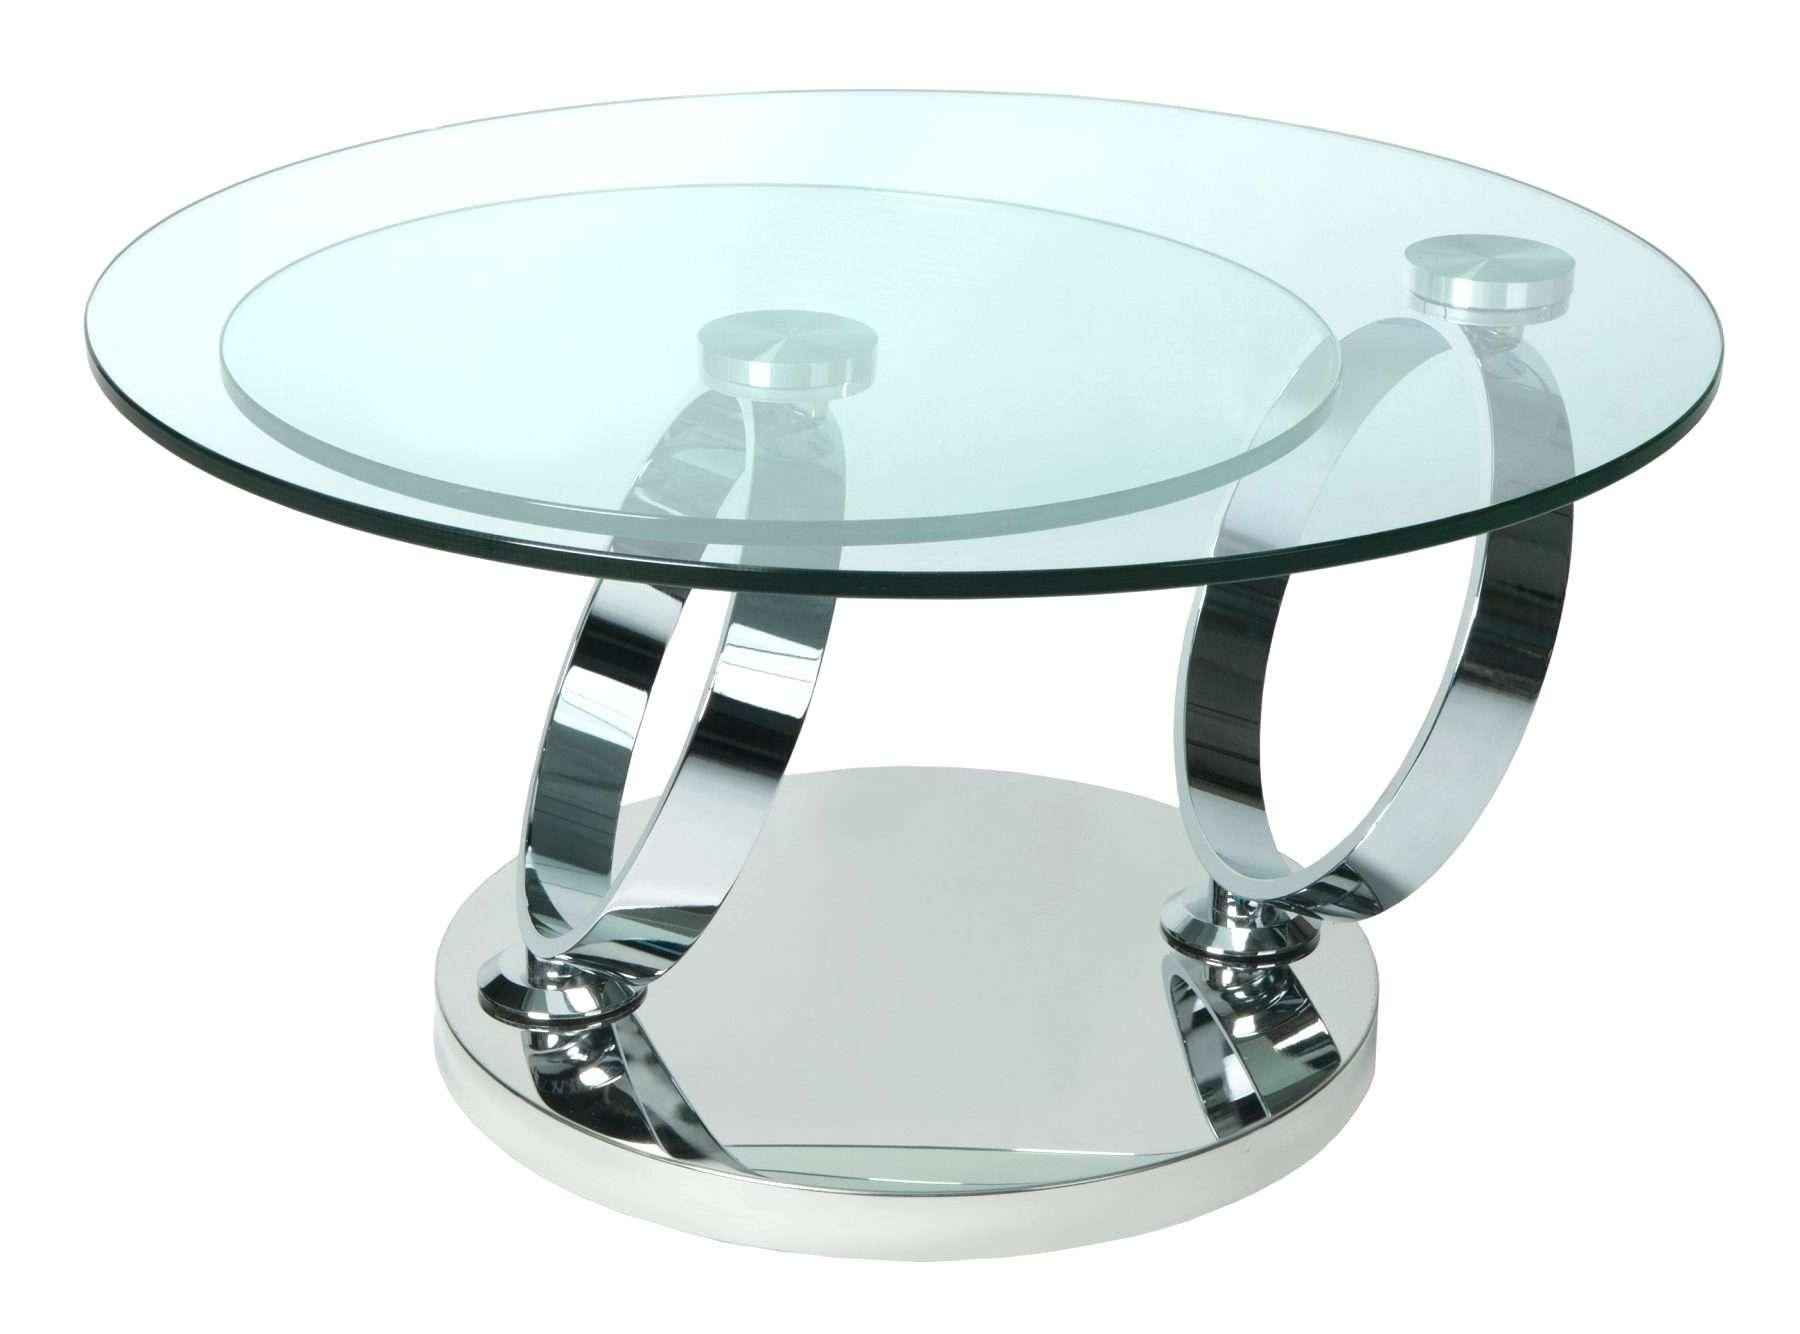 2018 Revolving Glass Coffee Tables Inside Revolving Glass Coffee Table – Coffee Tables (View 5 of 20)